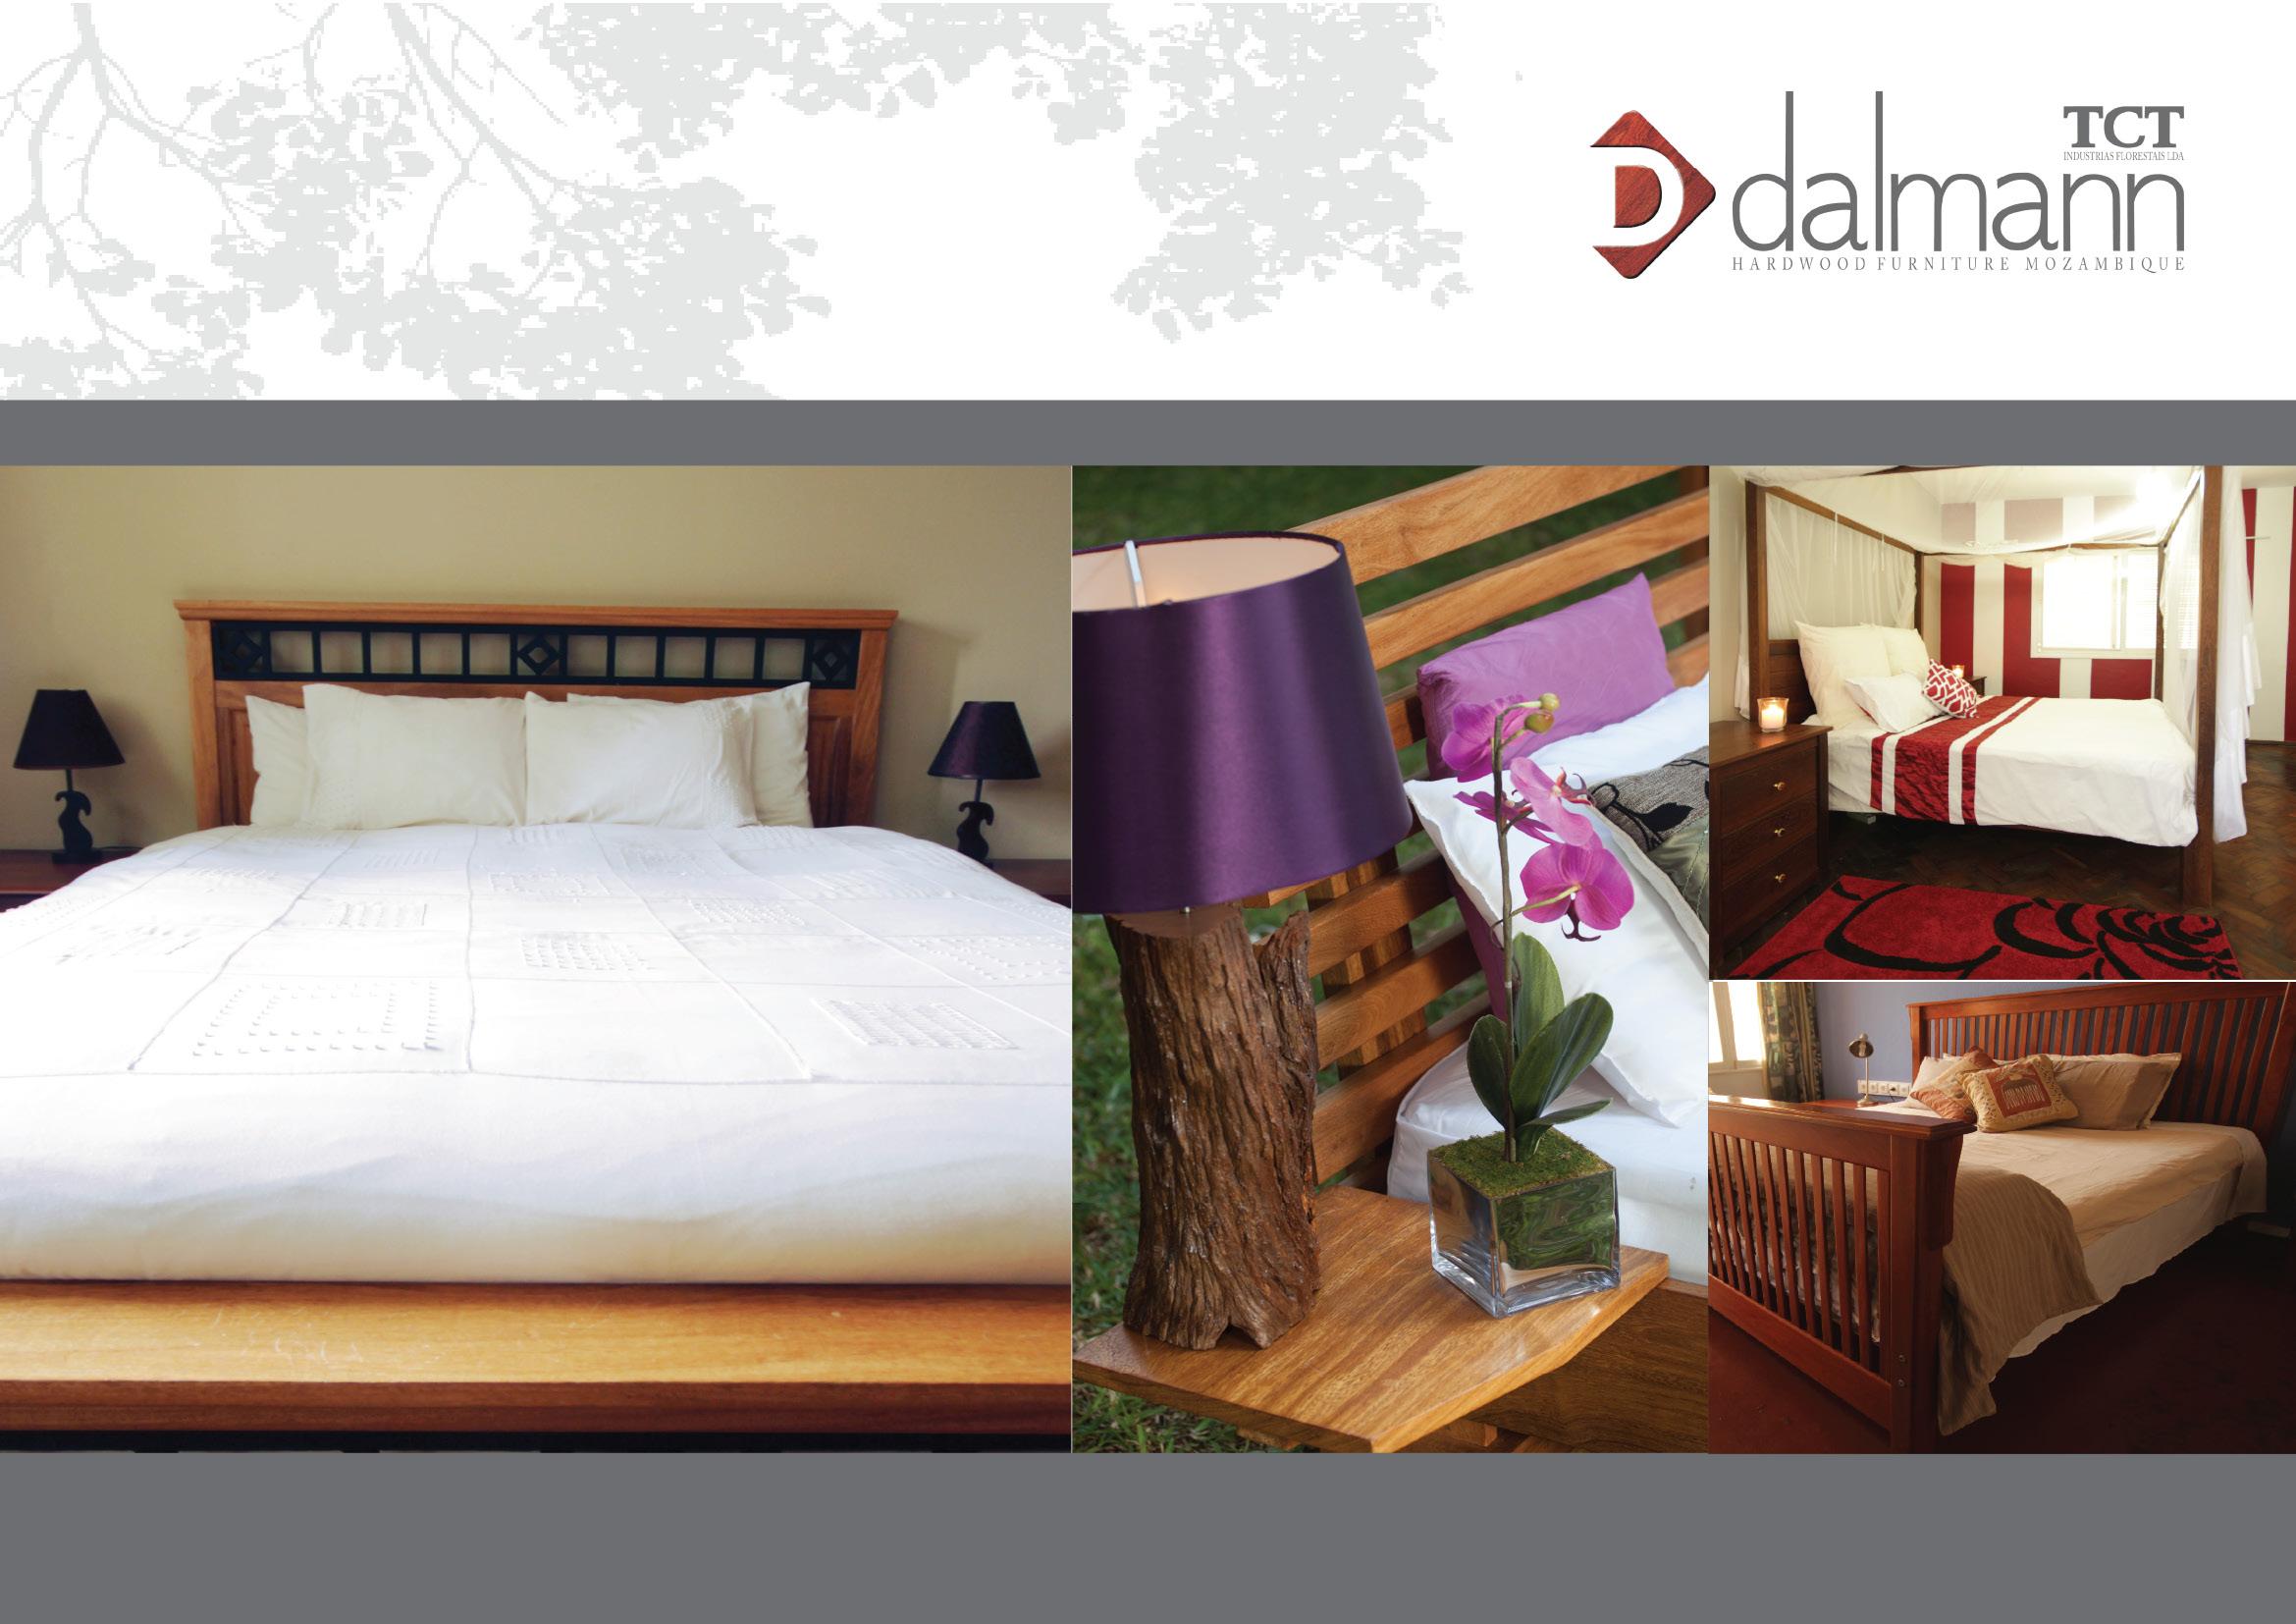 TCT Dalmann Brochura - Camas  TCT Dalmann Brochure - Beds